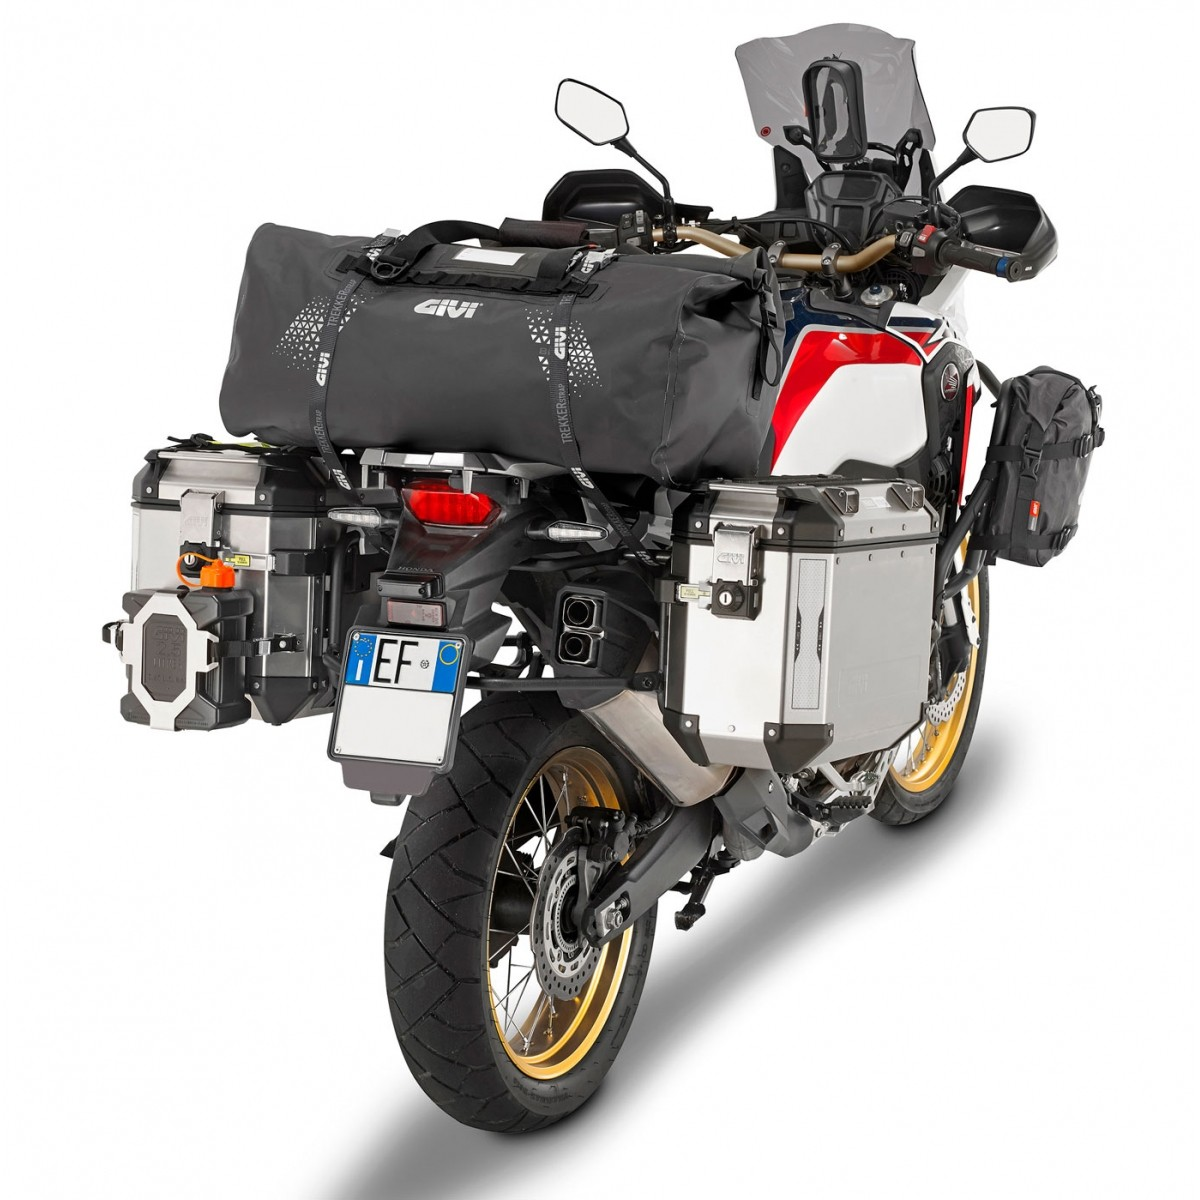 Bolsa Givi Traseira UT804 80 Litros Impermeável - Pronta Entrega  - Nova Suzuki Motos e Acessórios